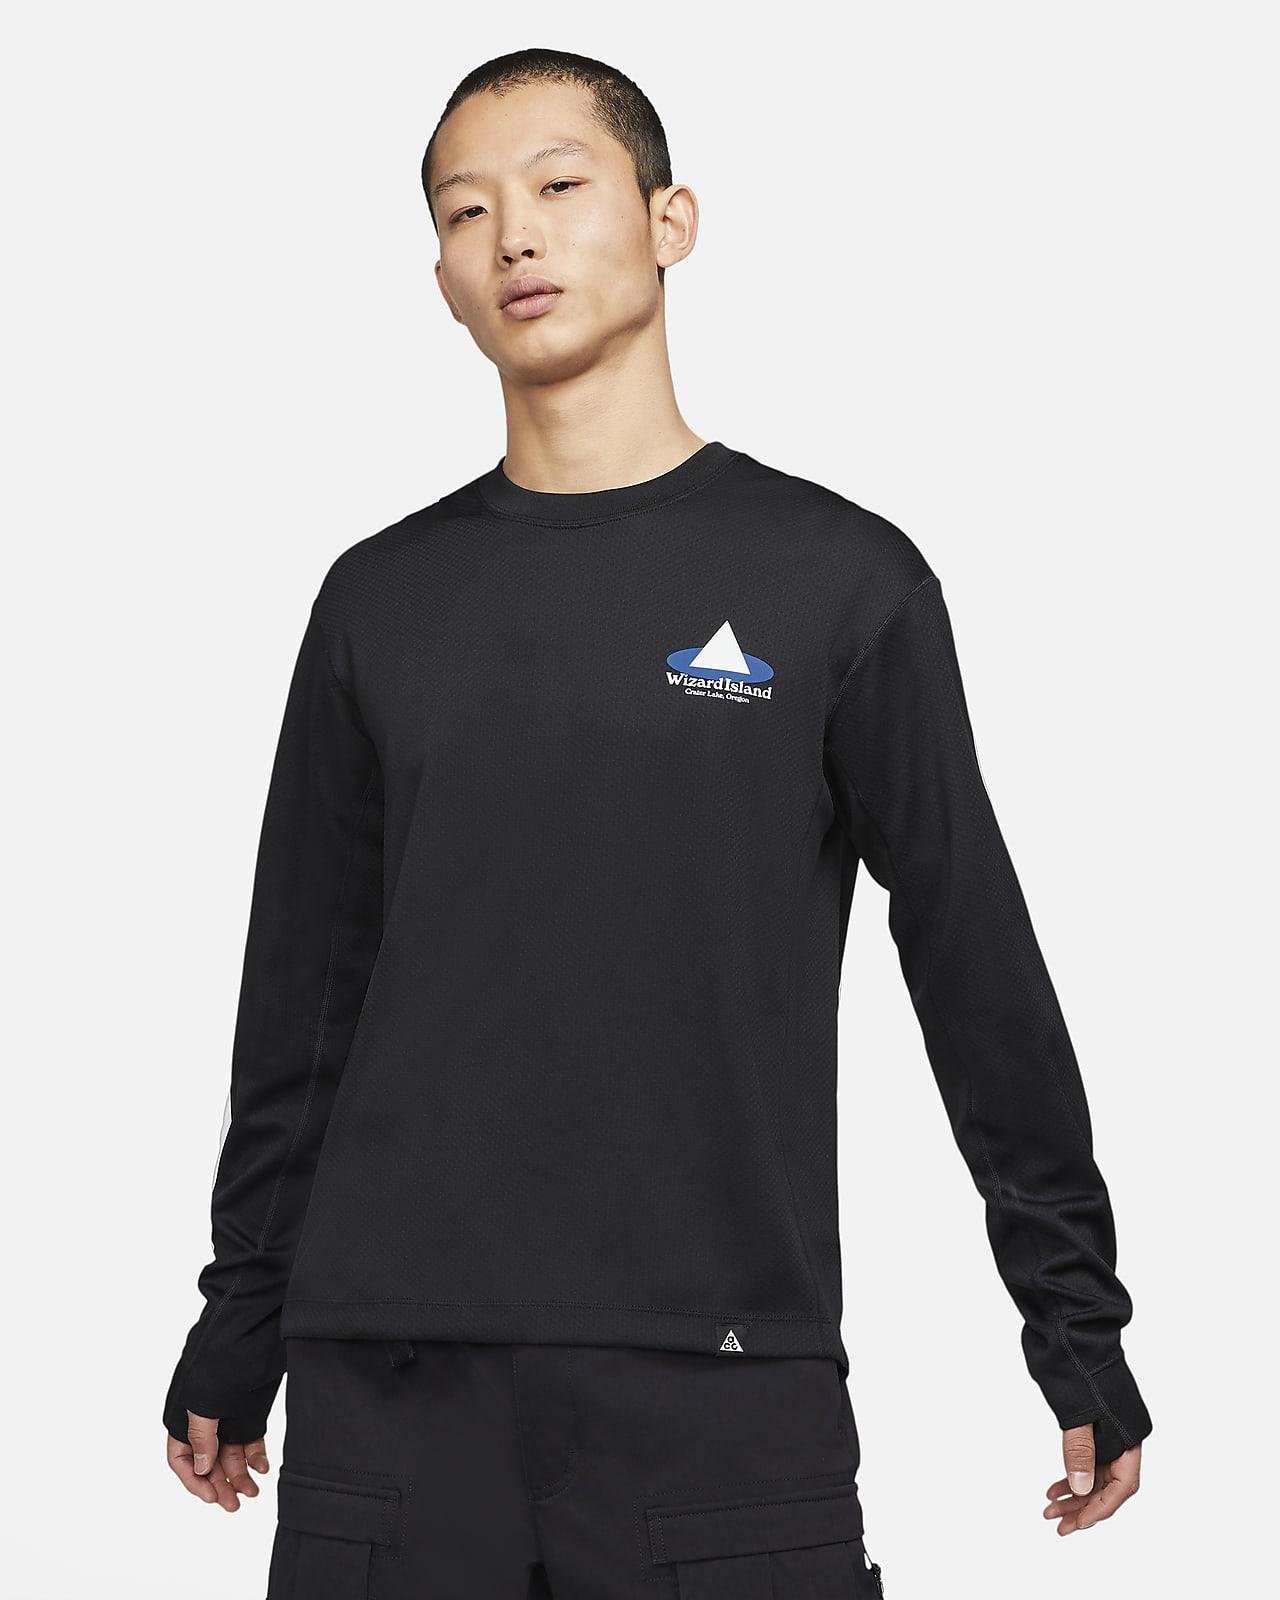 Nike ACG 'Wizard Island' Long-Sleeve Top